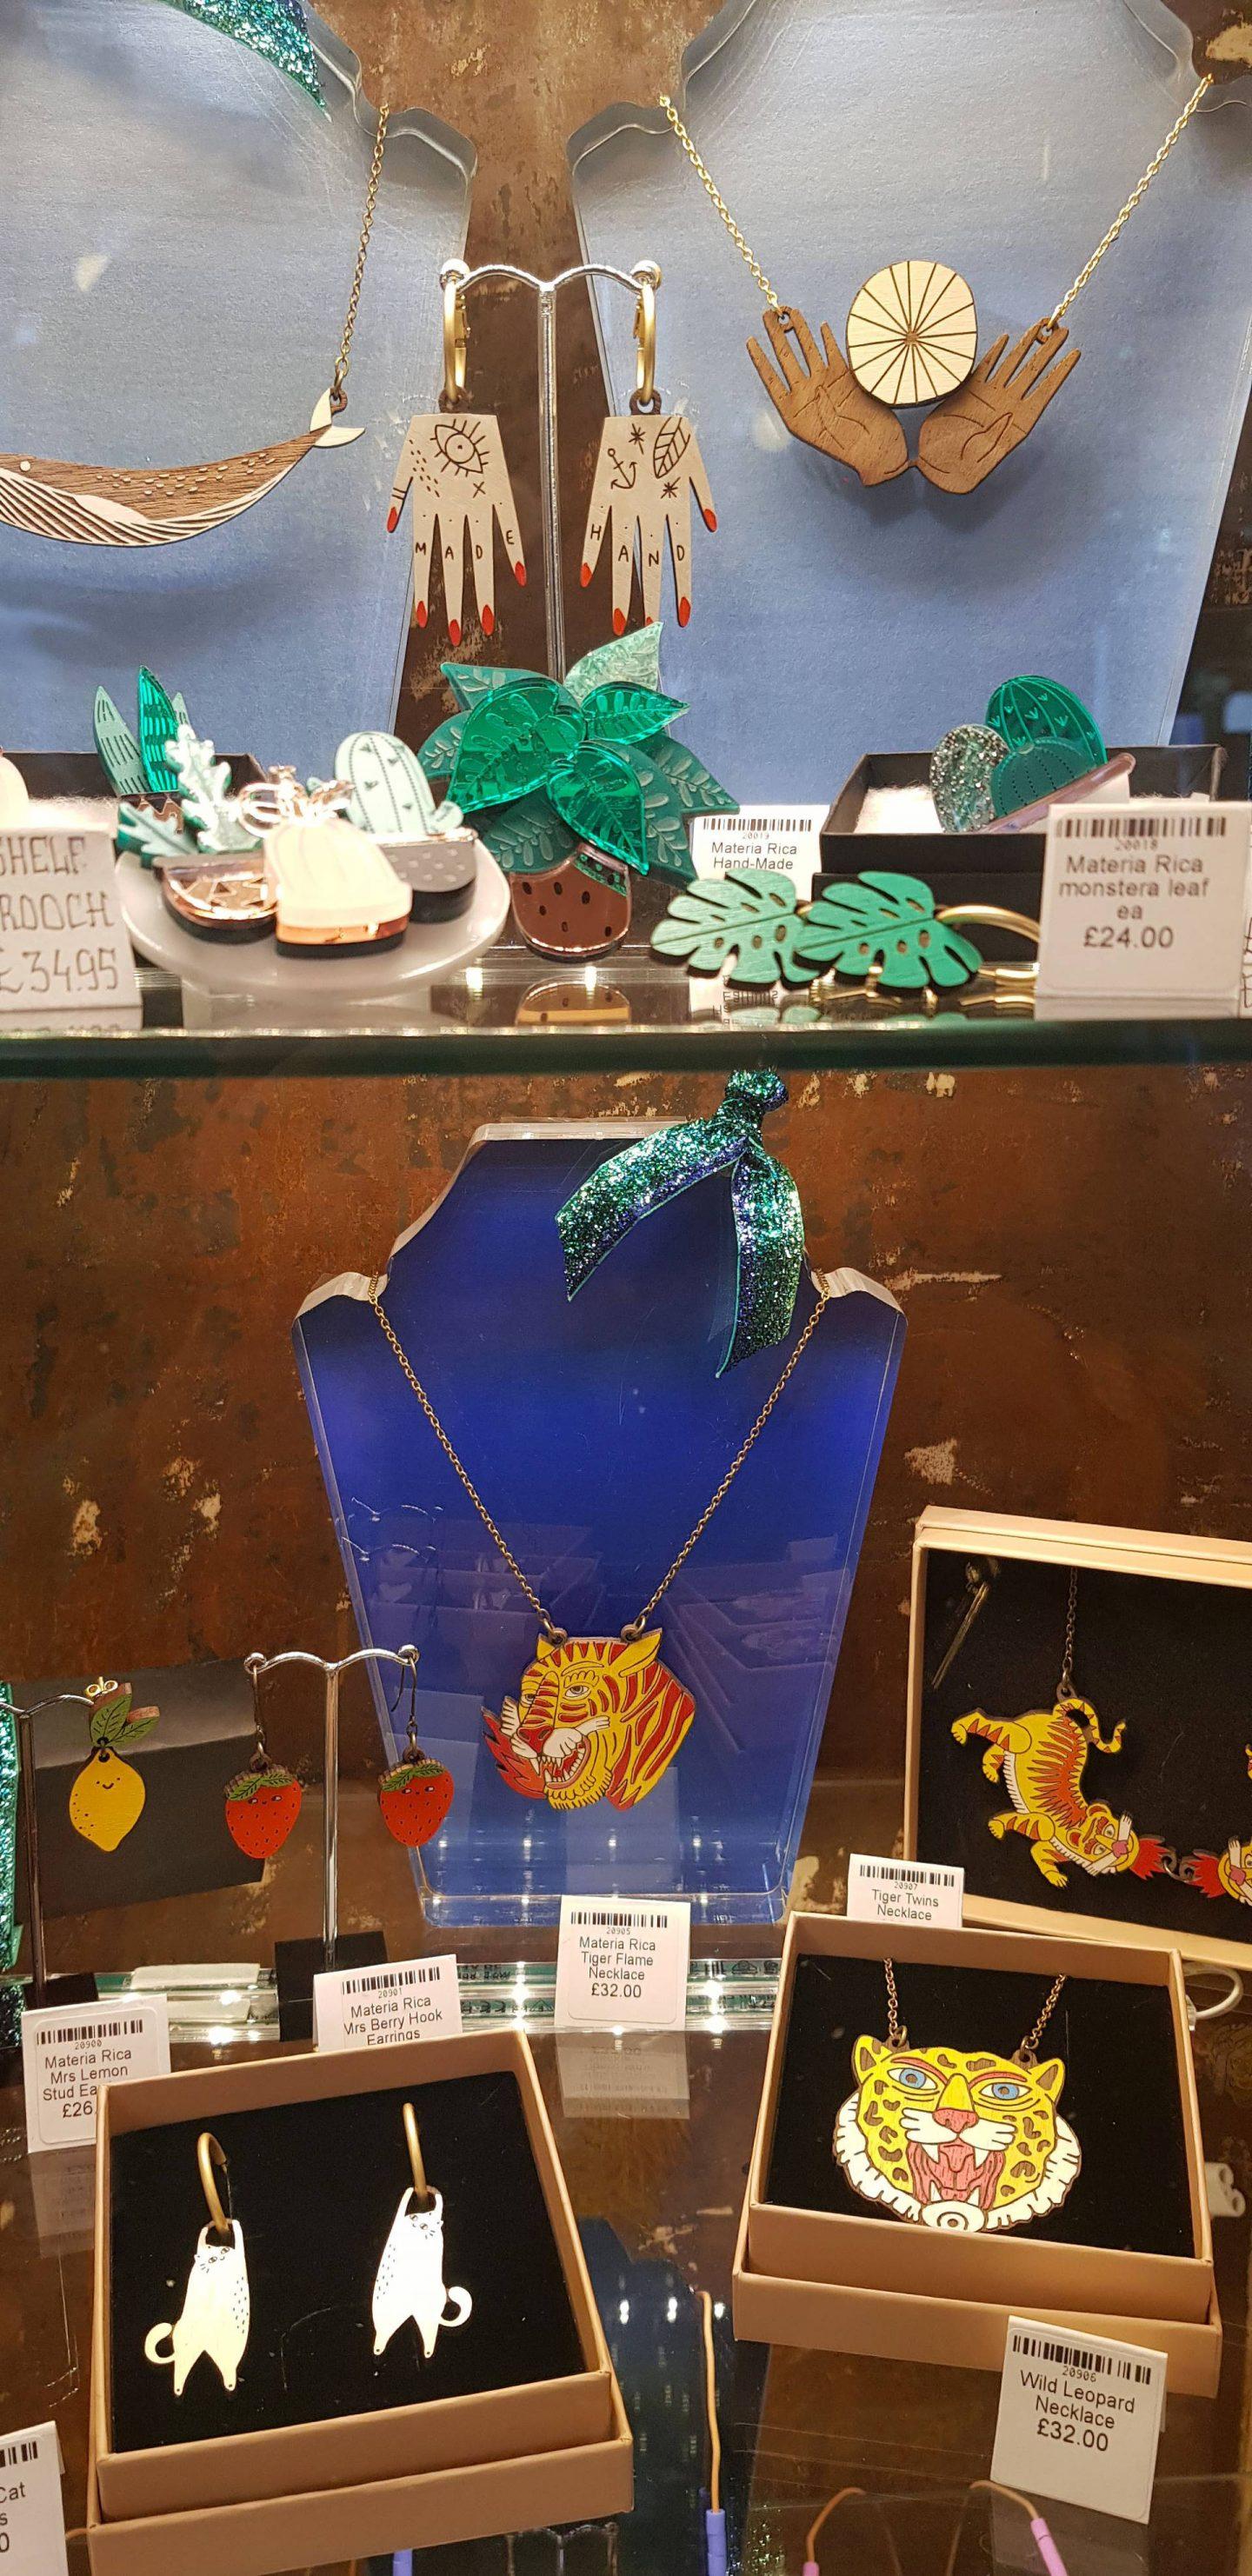 Oklahoma, Manchester, jewellery display, Materia Rica